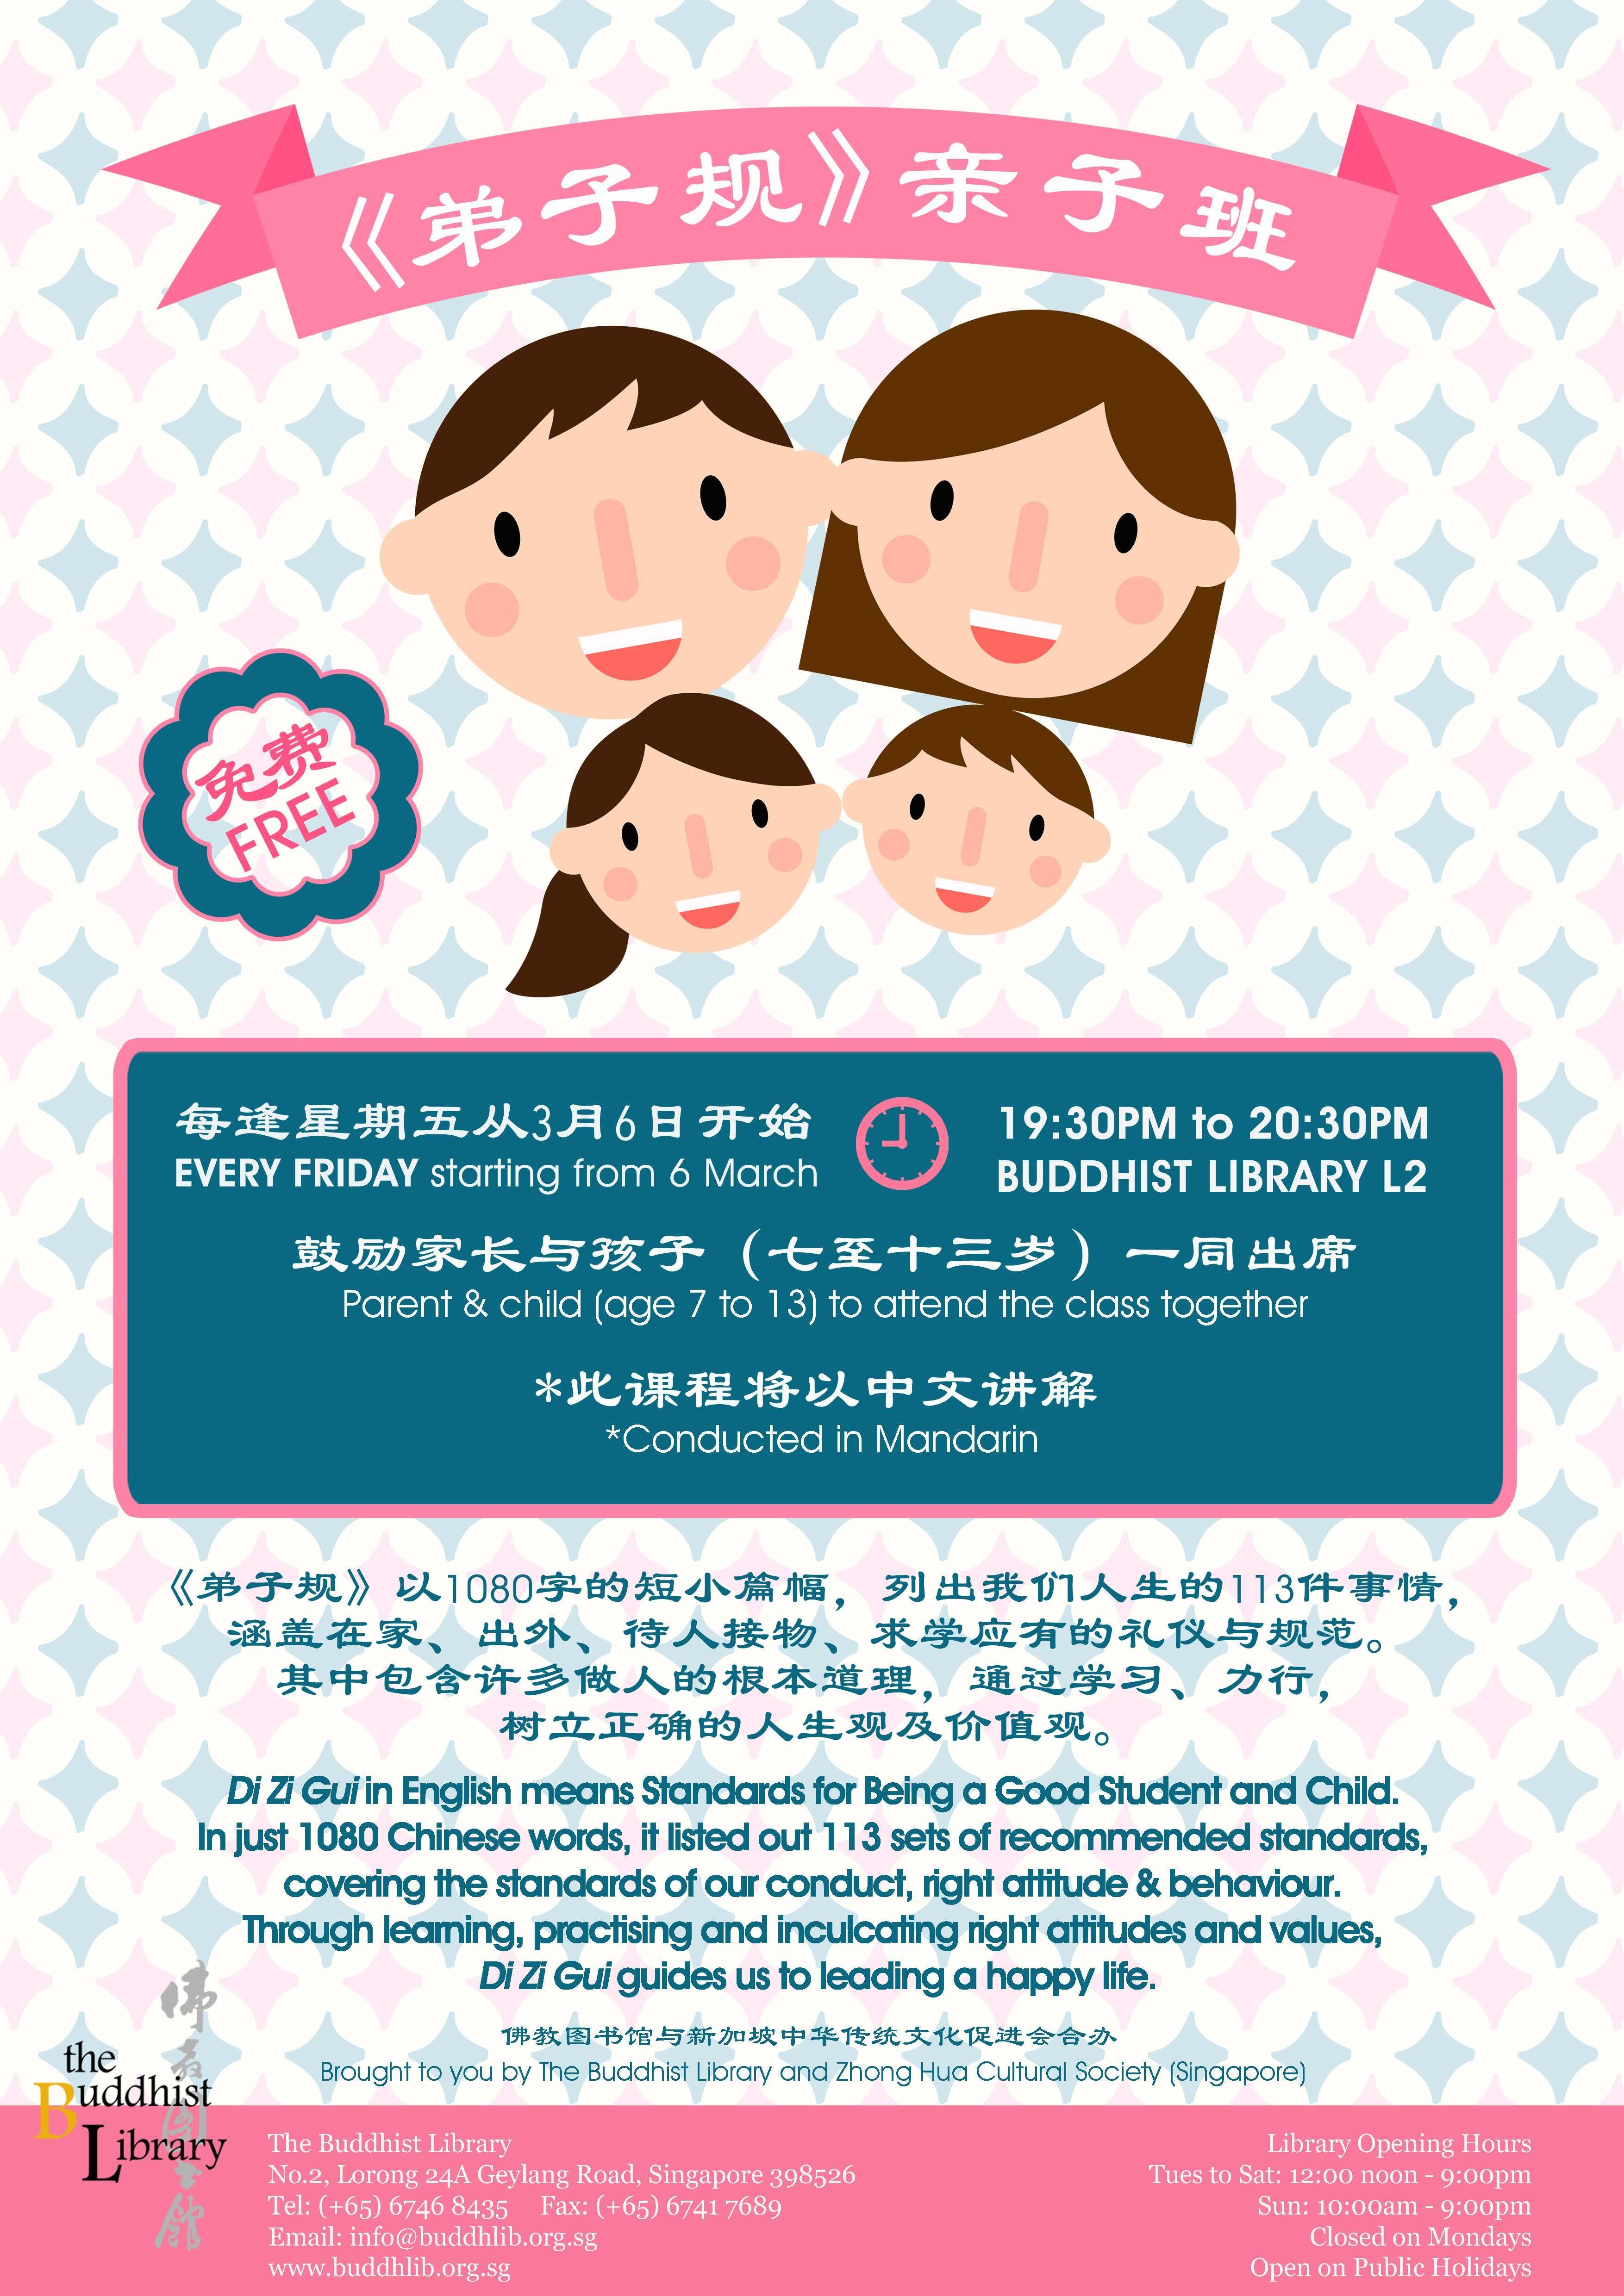 Poster design class 12 - Buddhist Library Di Zi Gui Poster Design Illustration Www Freepik Com